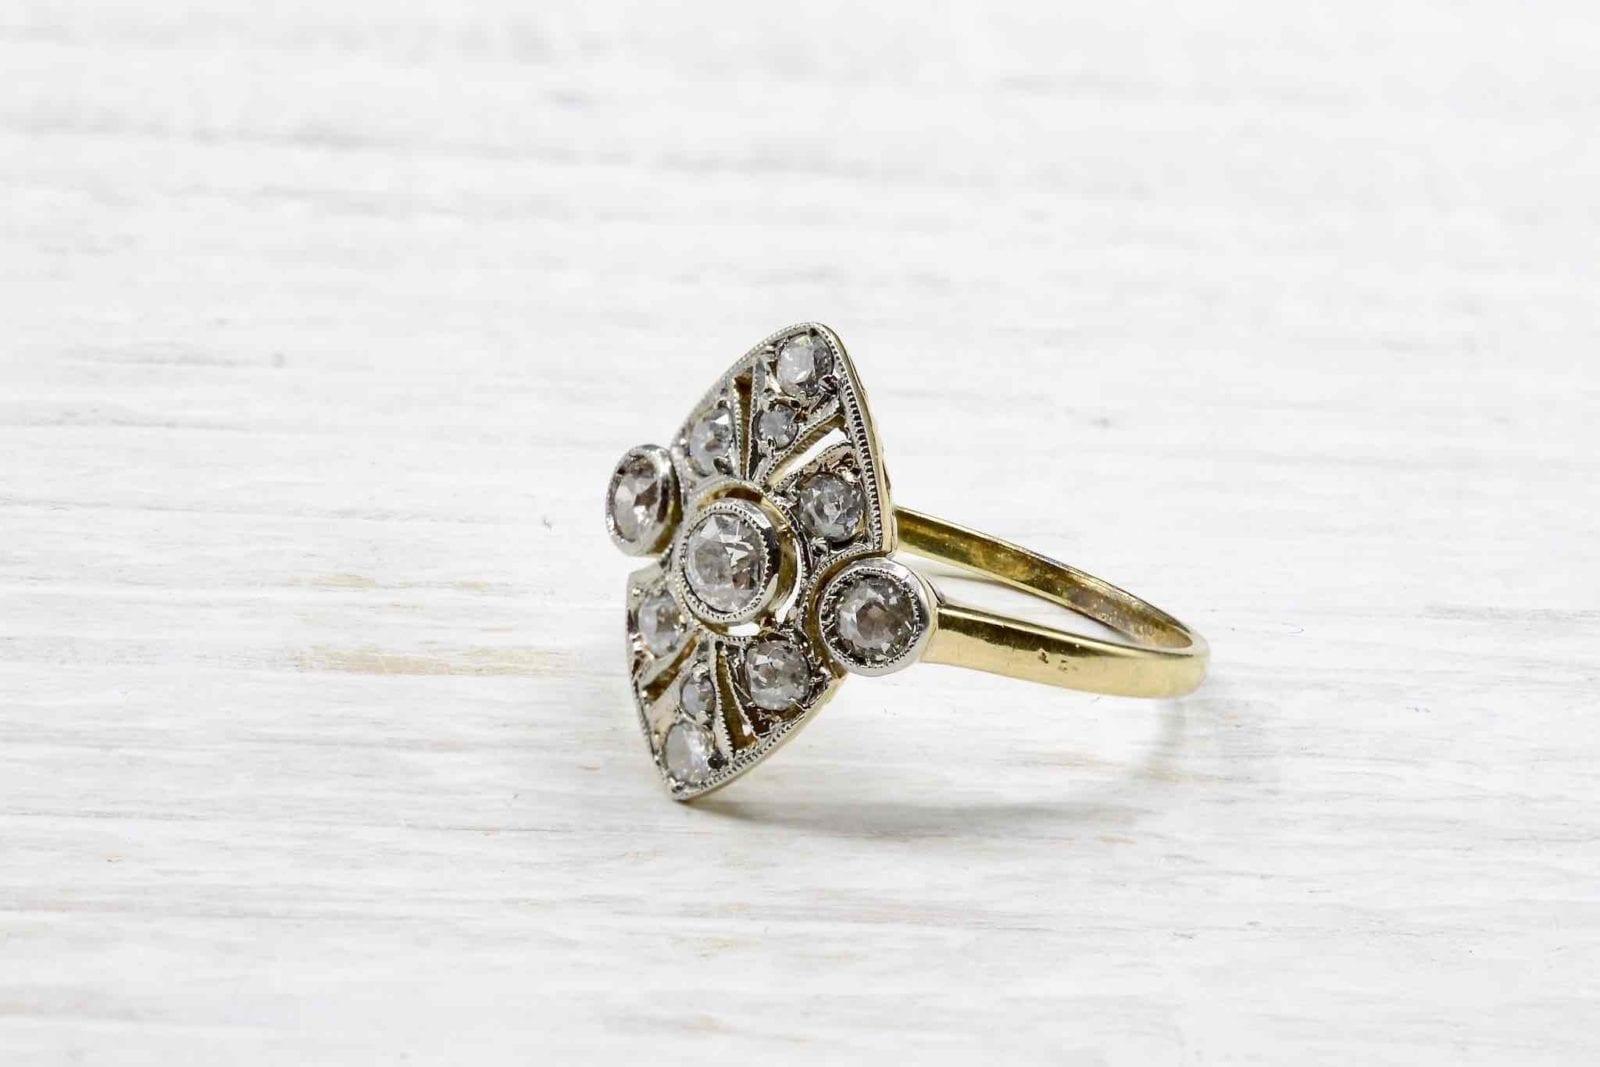 bague vintage diamants or jaune 18k